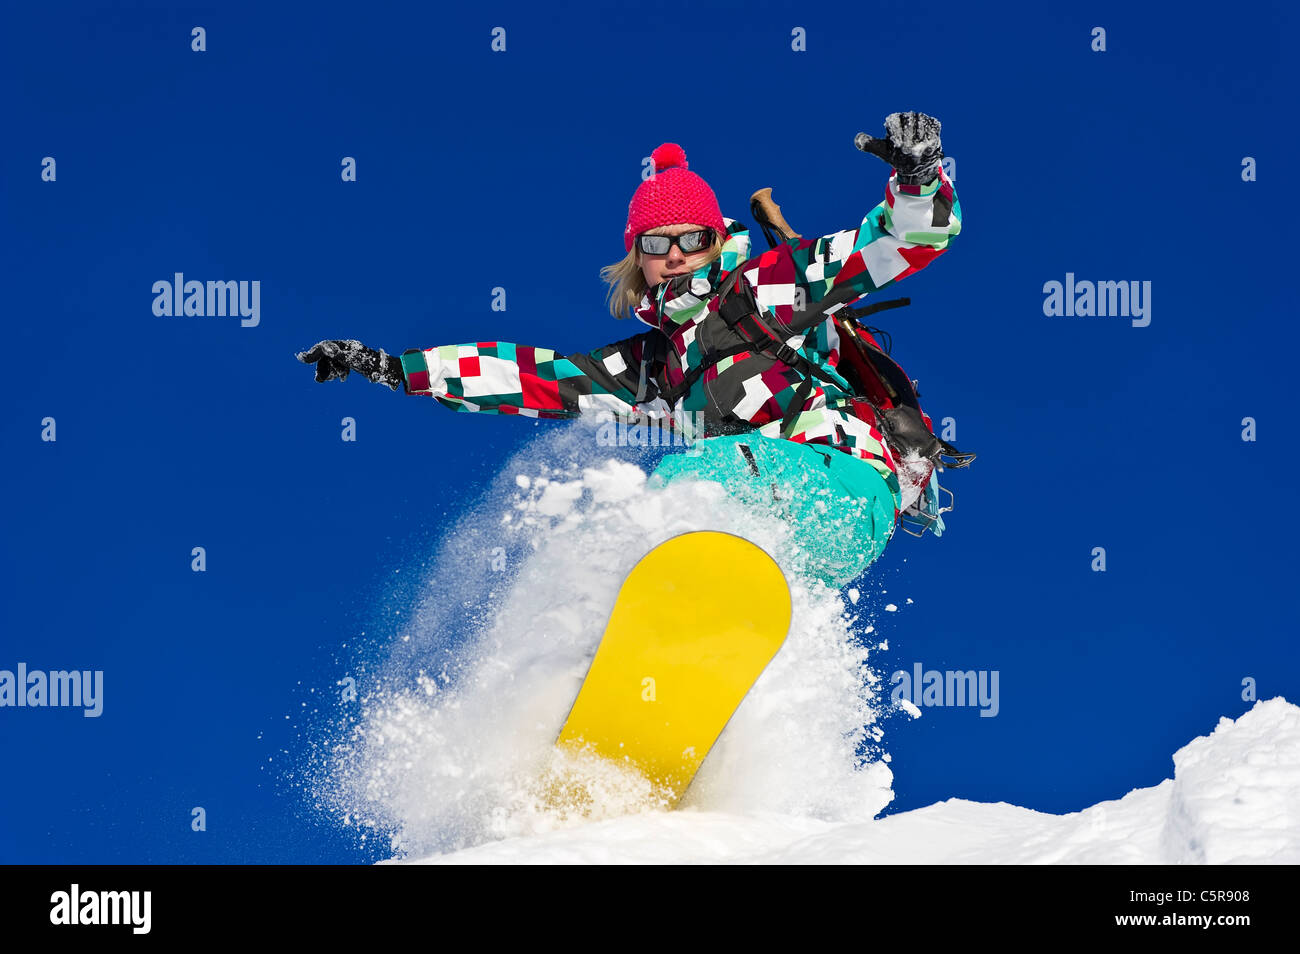 A female snowboarder riding hard through deep fresh powder snow. - Stock Image